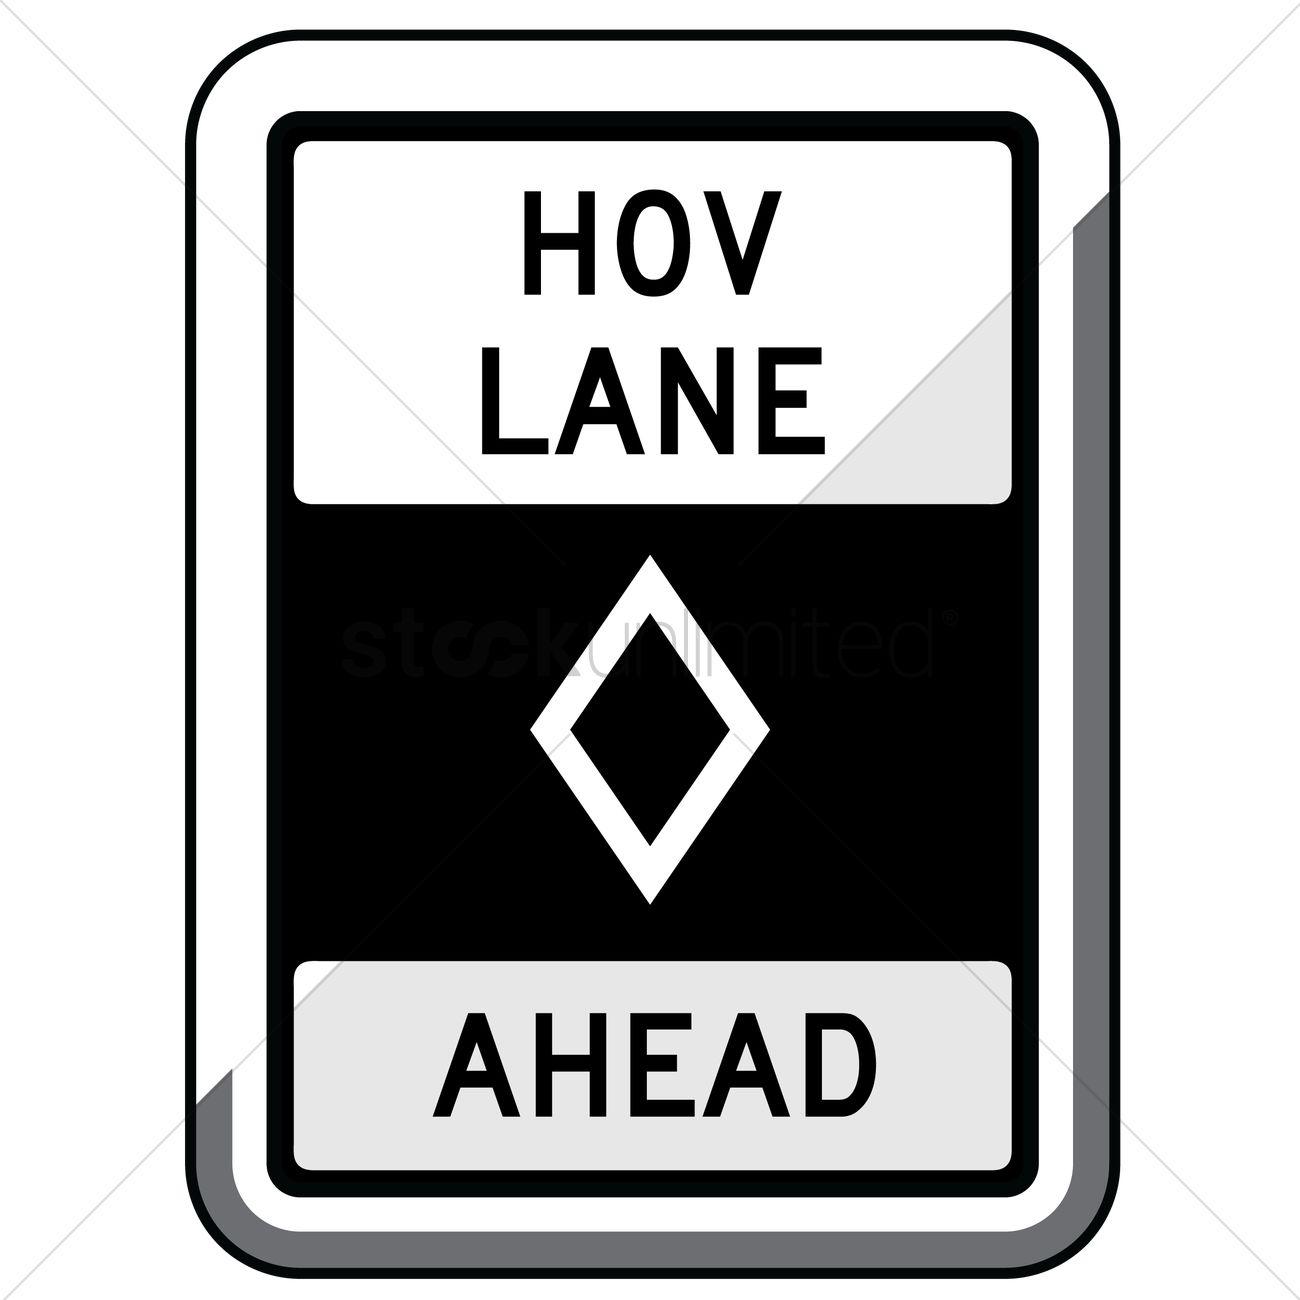 Hov lane ahead (ground mount) Vector Image.